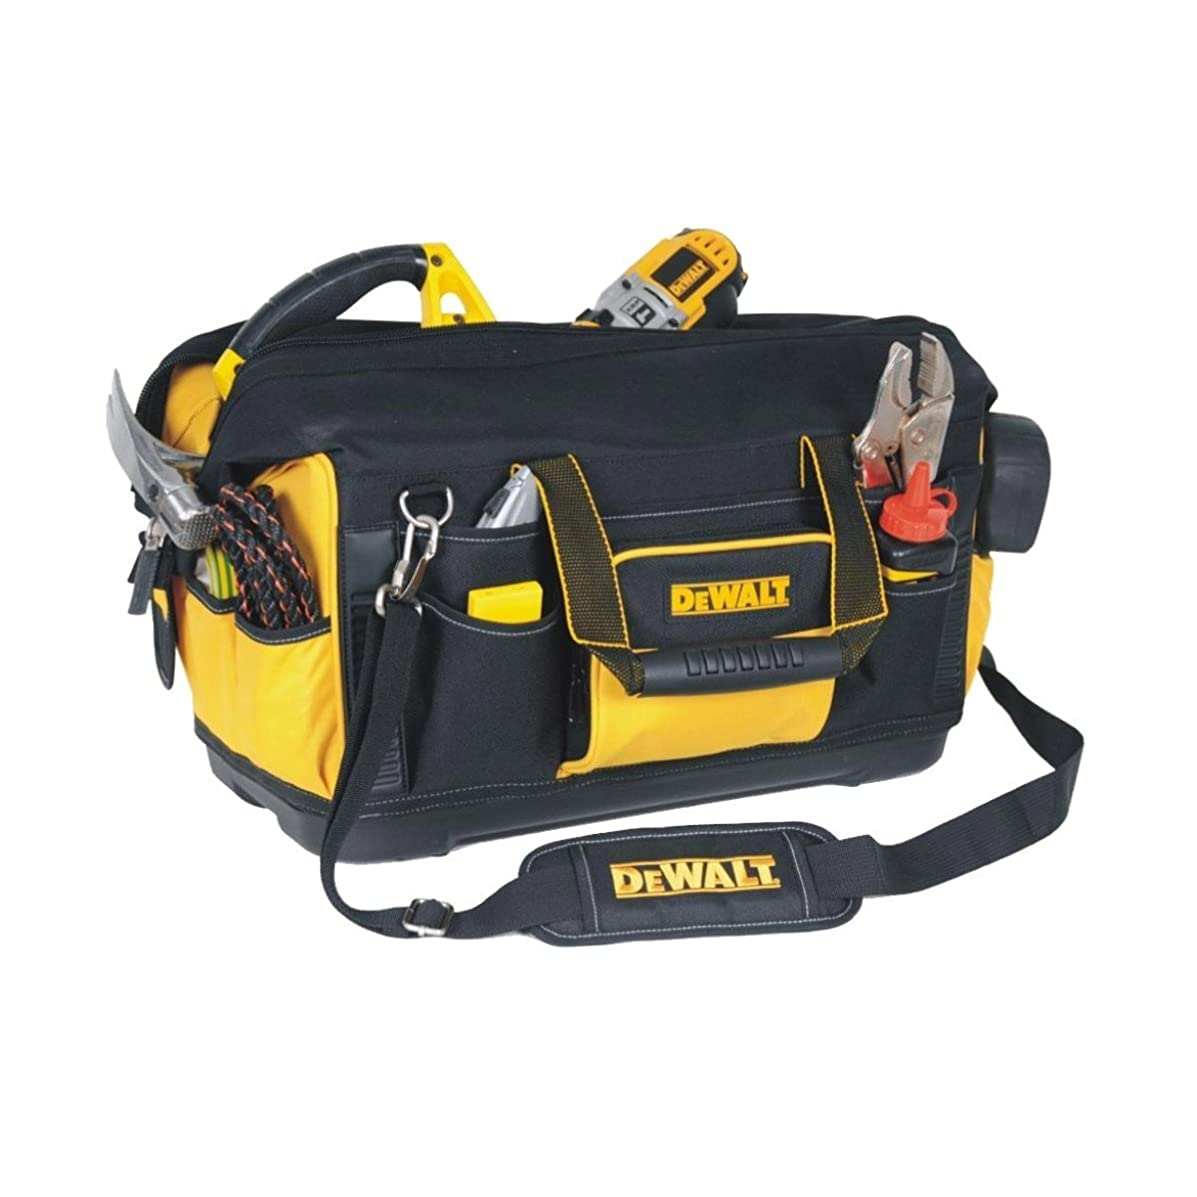 DeWalt 179209 Pro Open Mouth Bag 1-79-209 by DEWALT